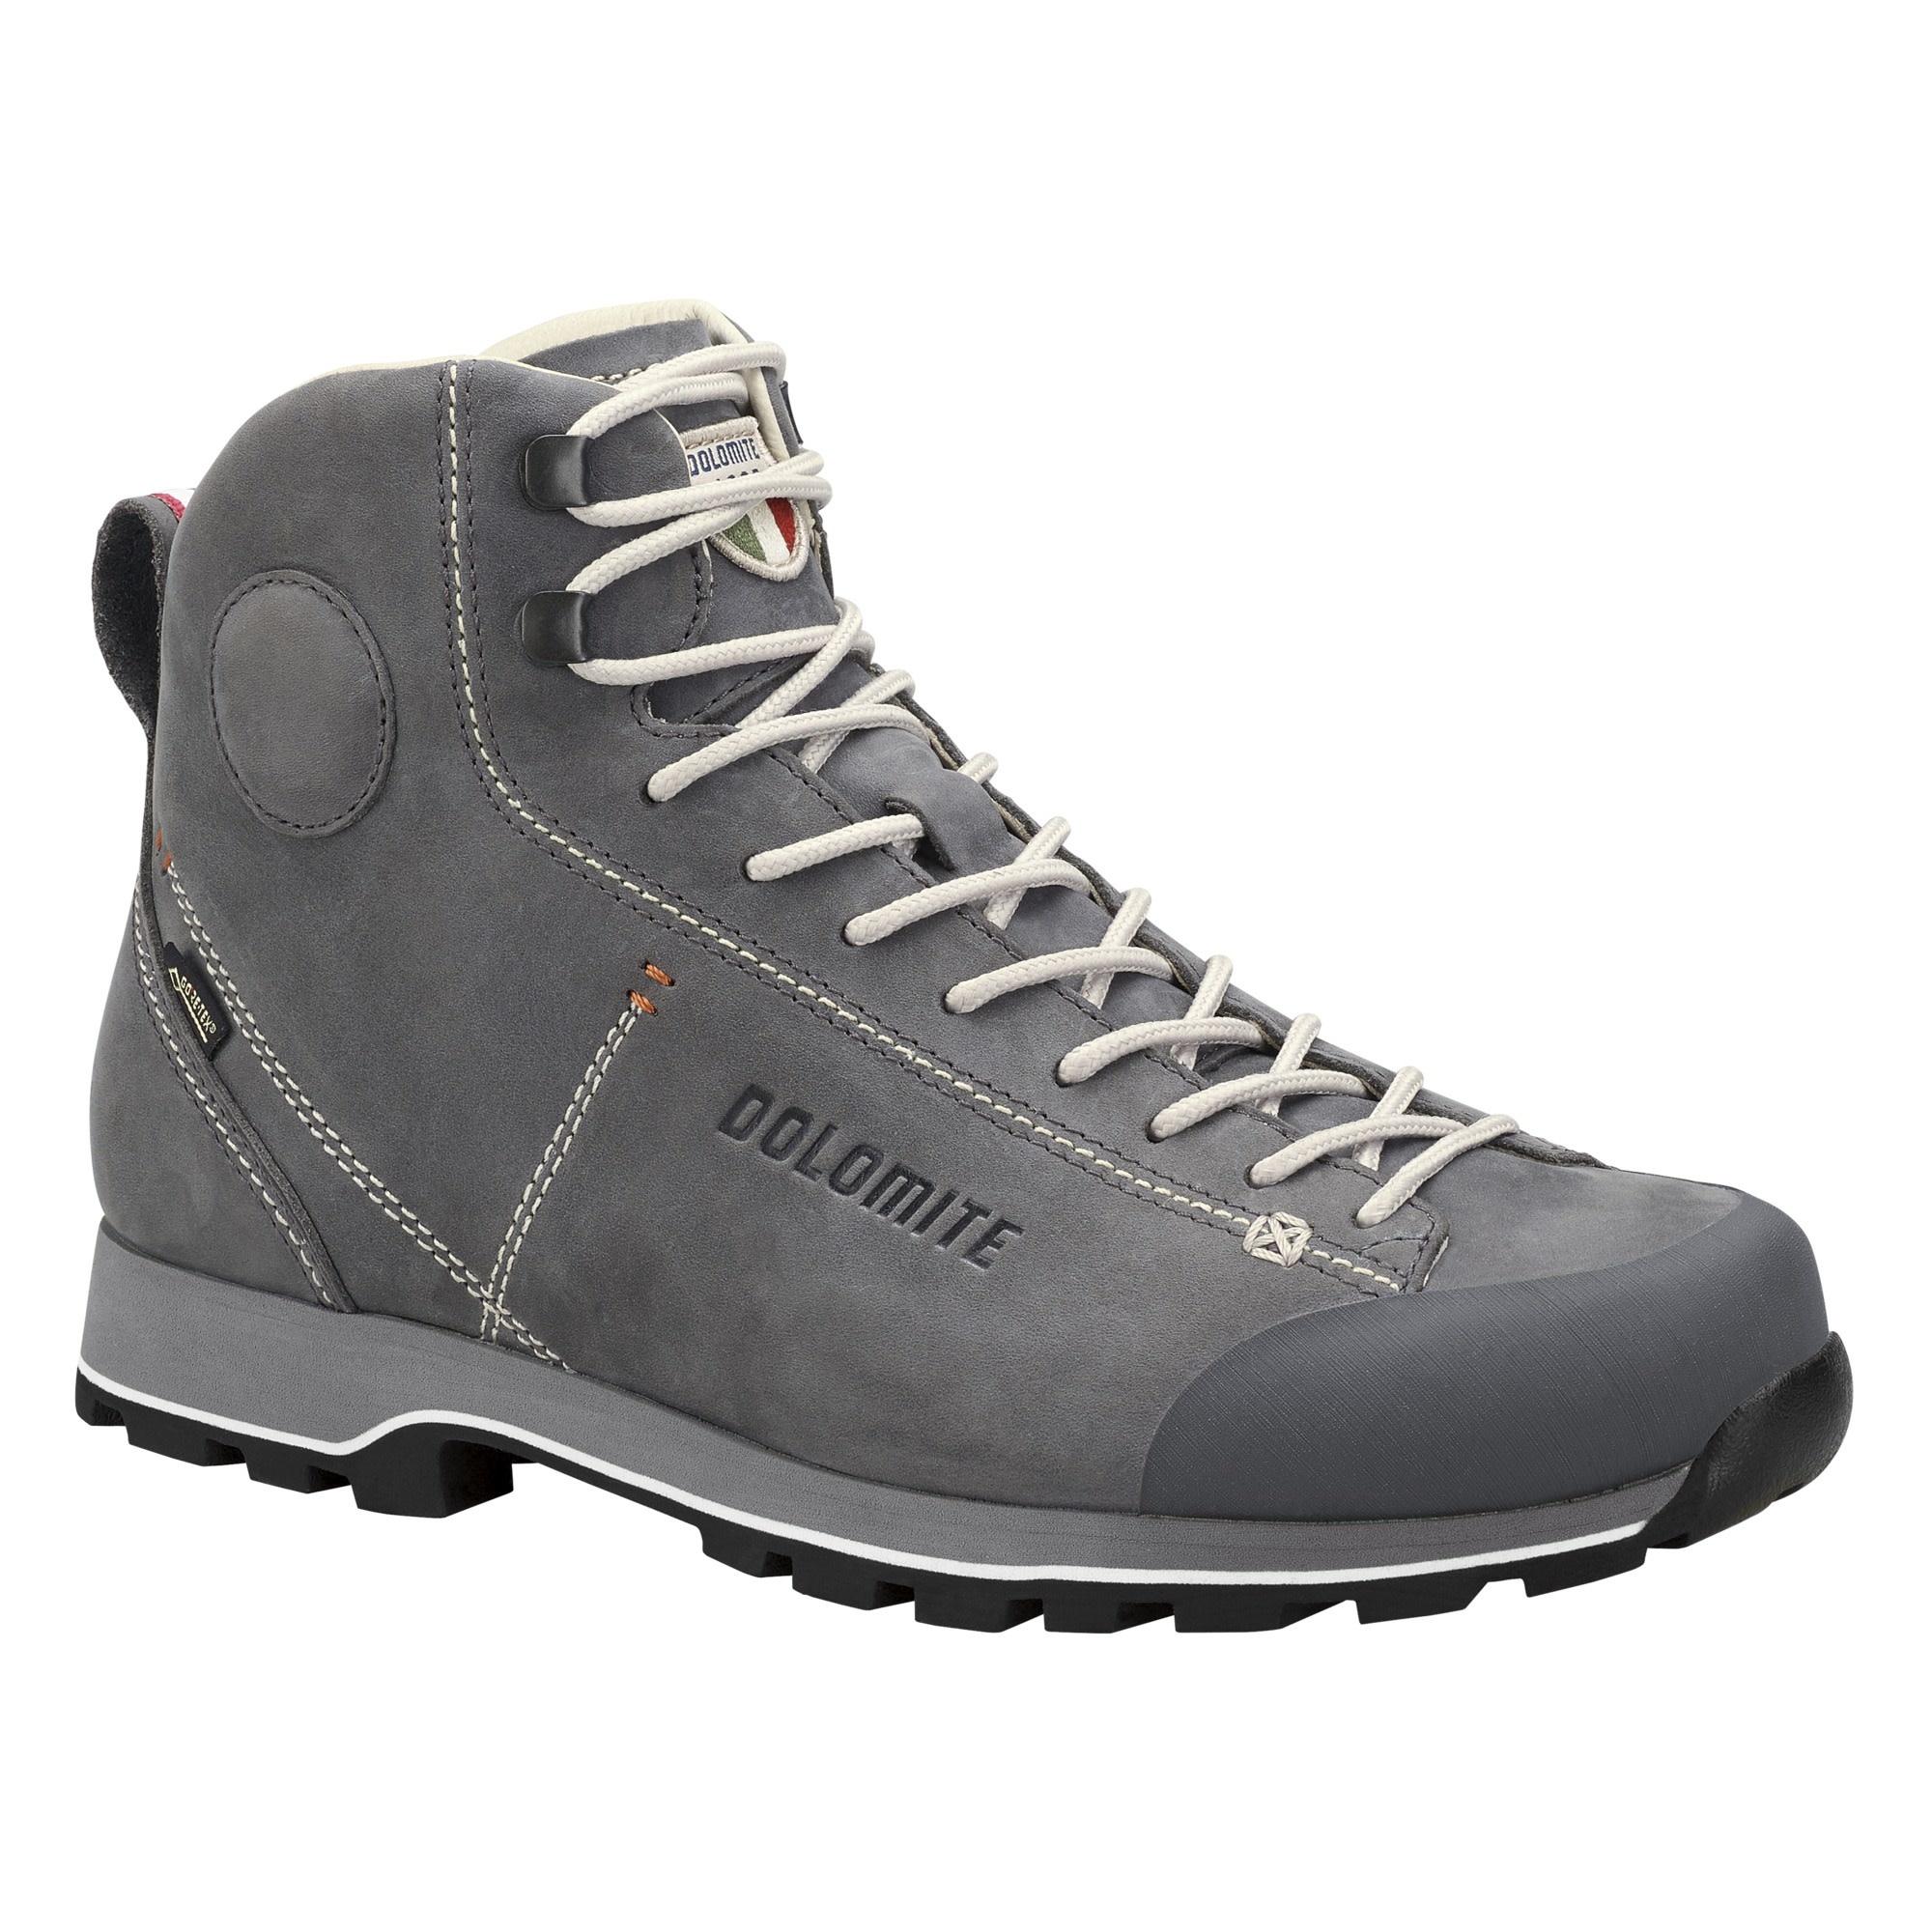 Dolomite 54 High FG GTX Gunmetal Grey 247958 1076